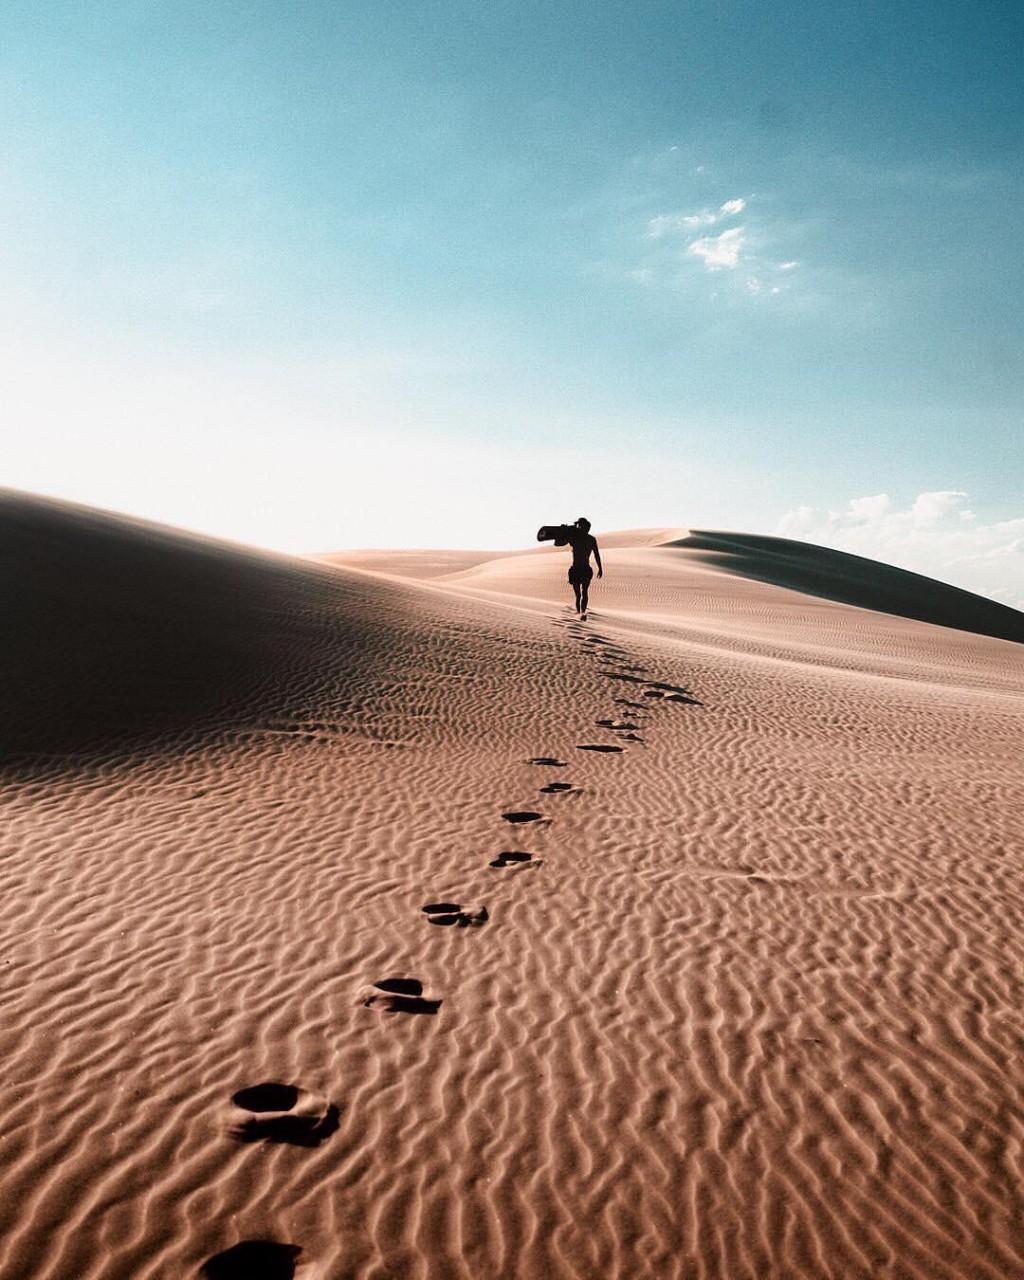 sandboarding anna bay sand dunes jetabout